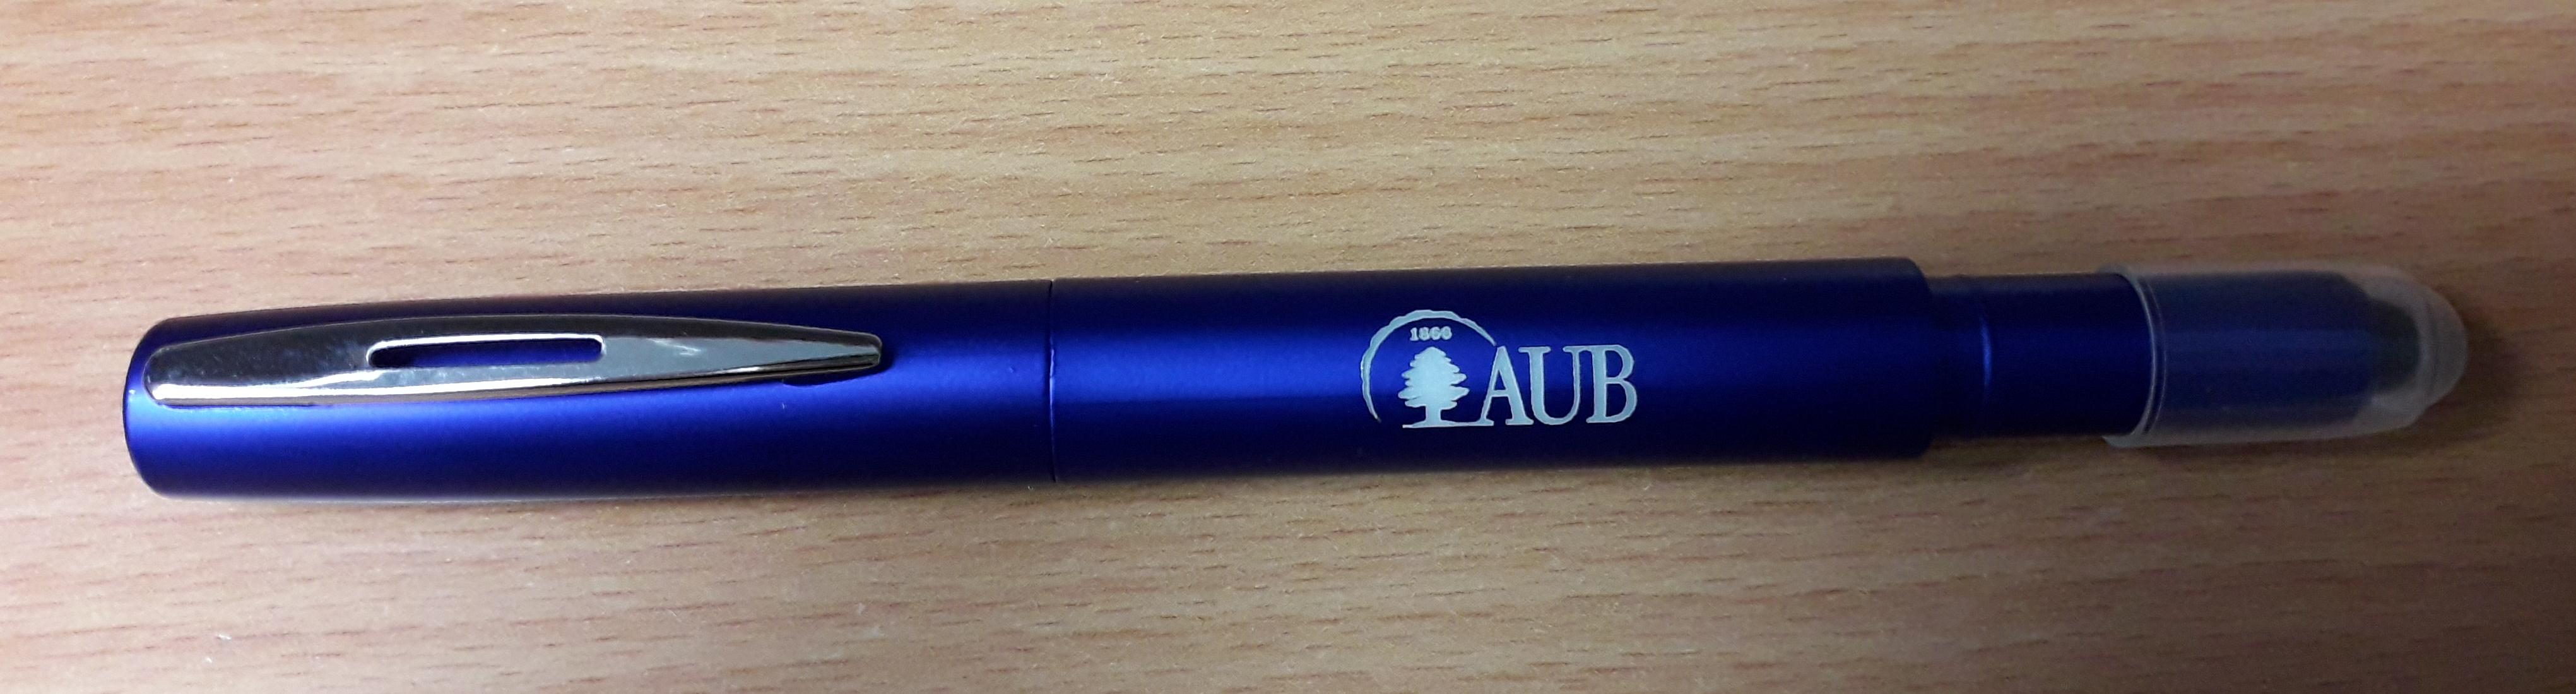 AUB   Ball Pen   Laser   W/Stylus   Blue